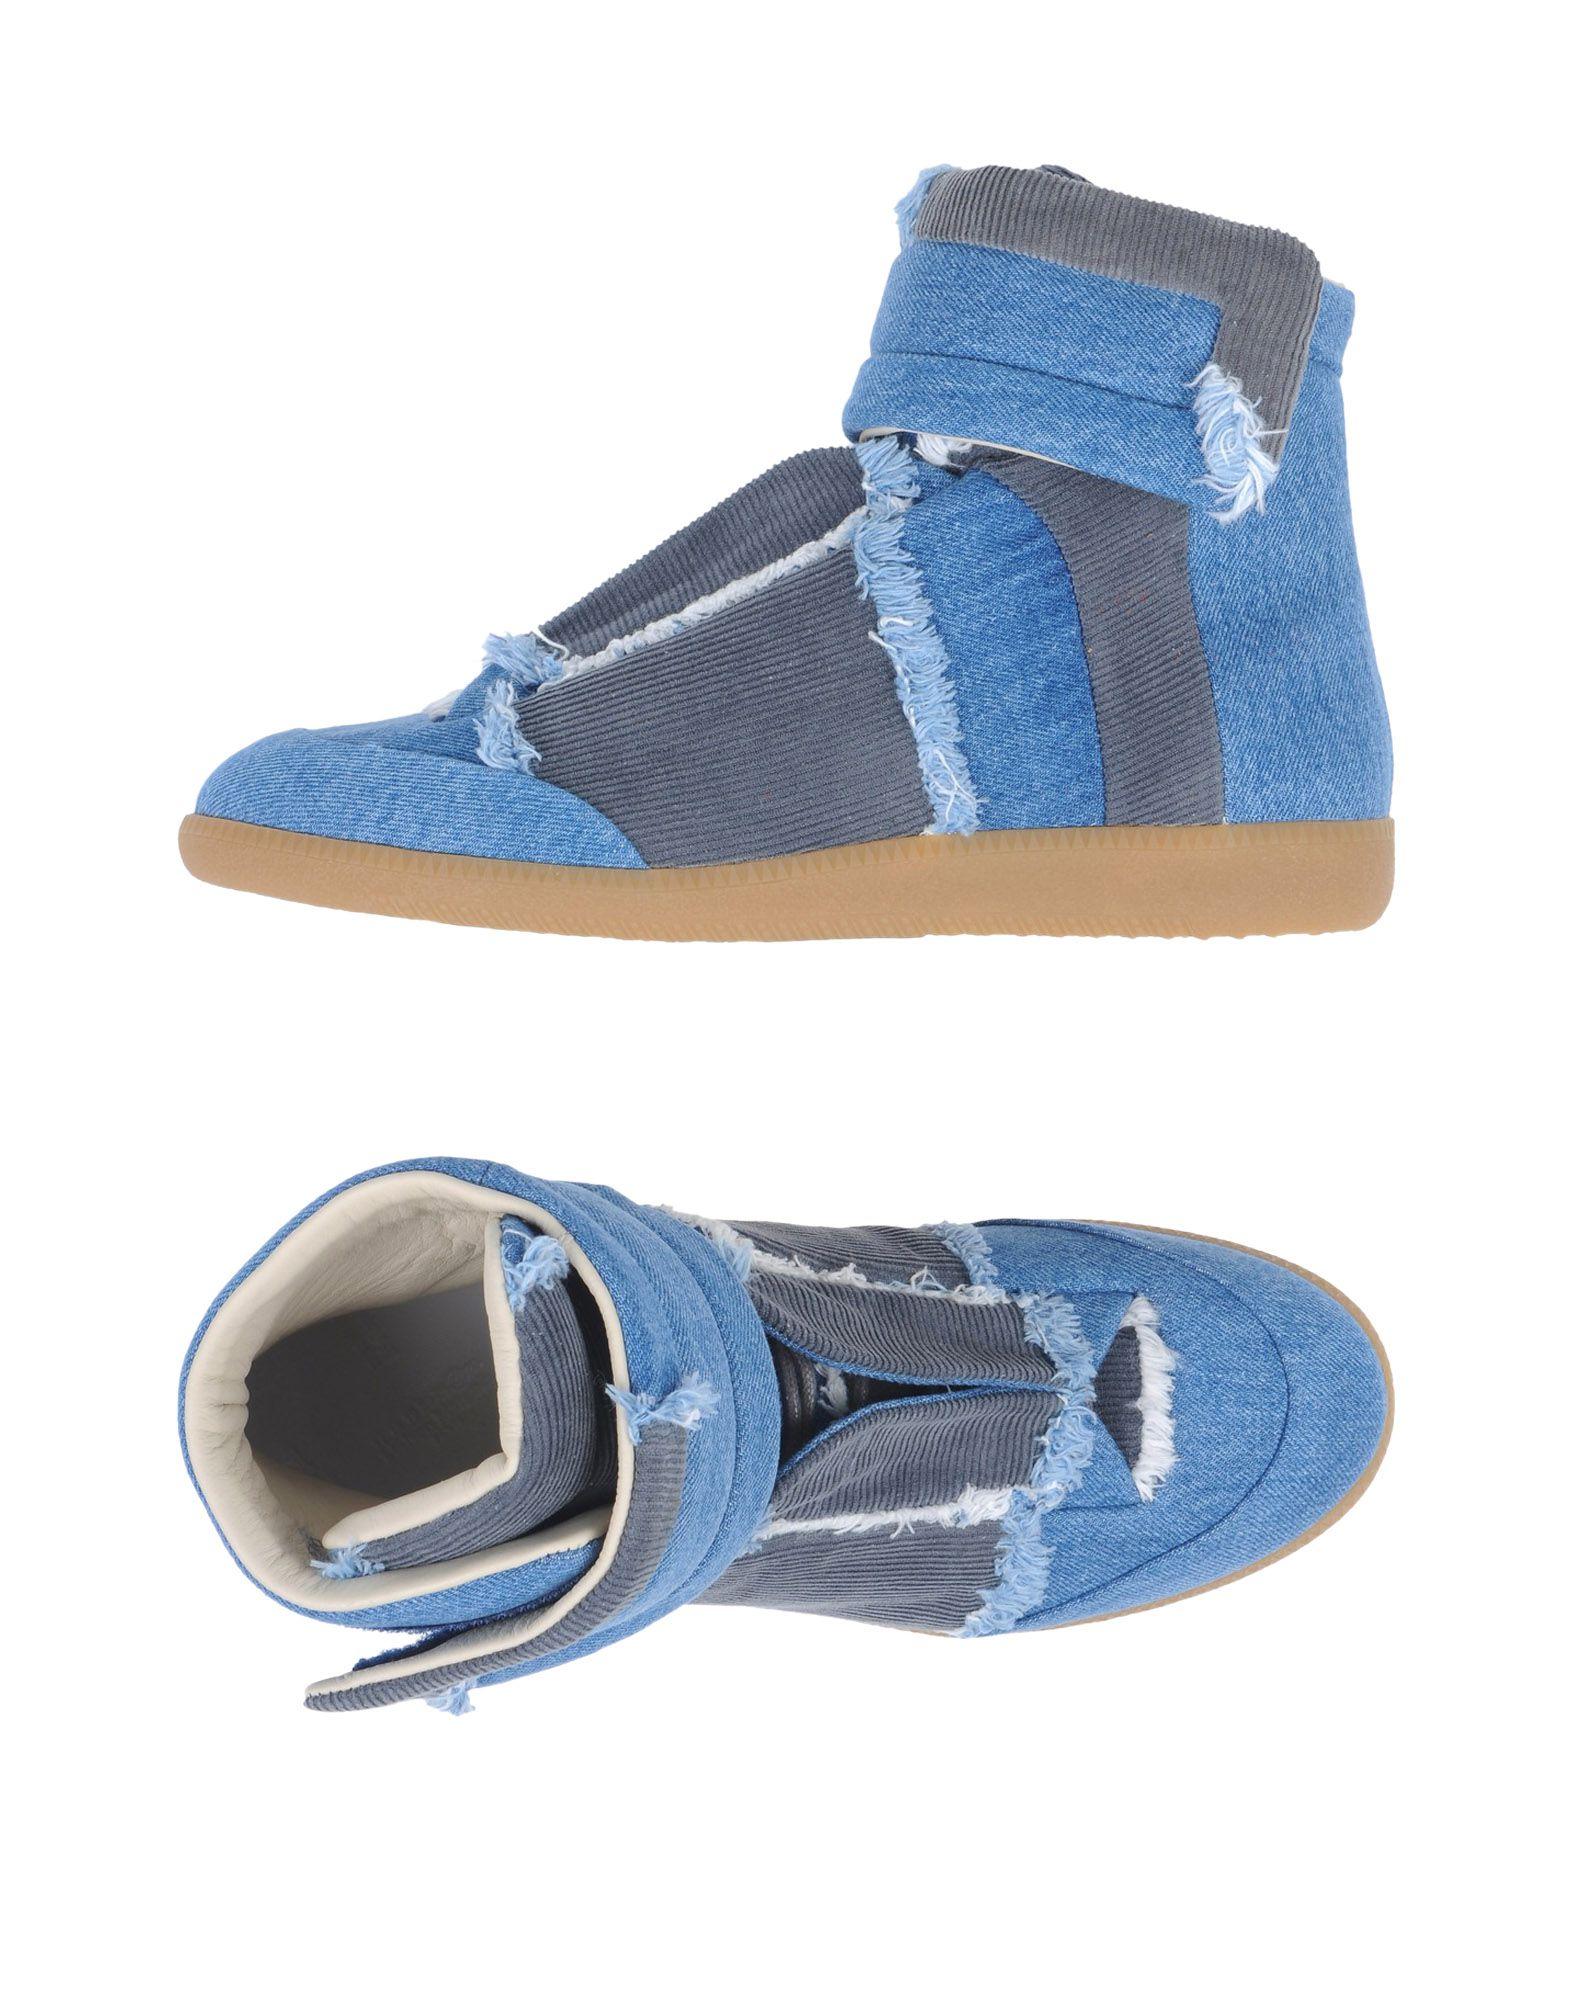 Maison Margiela Gute Sneakers Herren  11351902DQ Gute Margiela Qualität beliebte Schuhe 8694fe